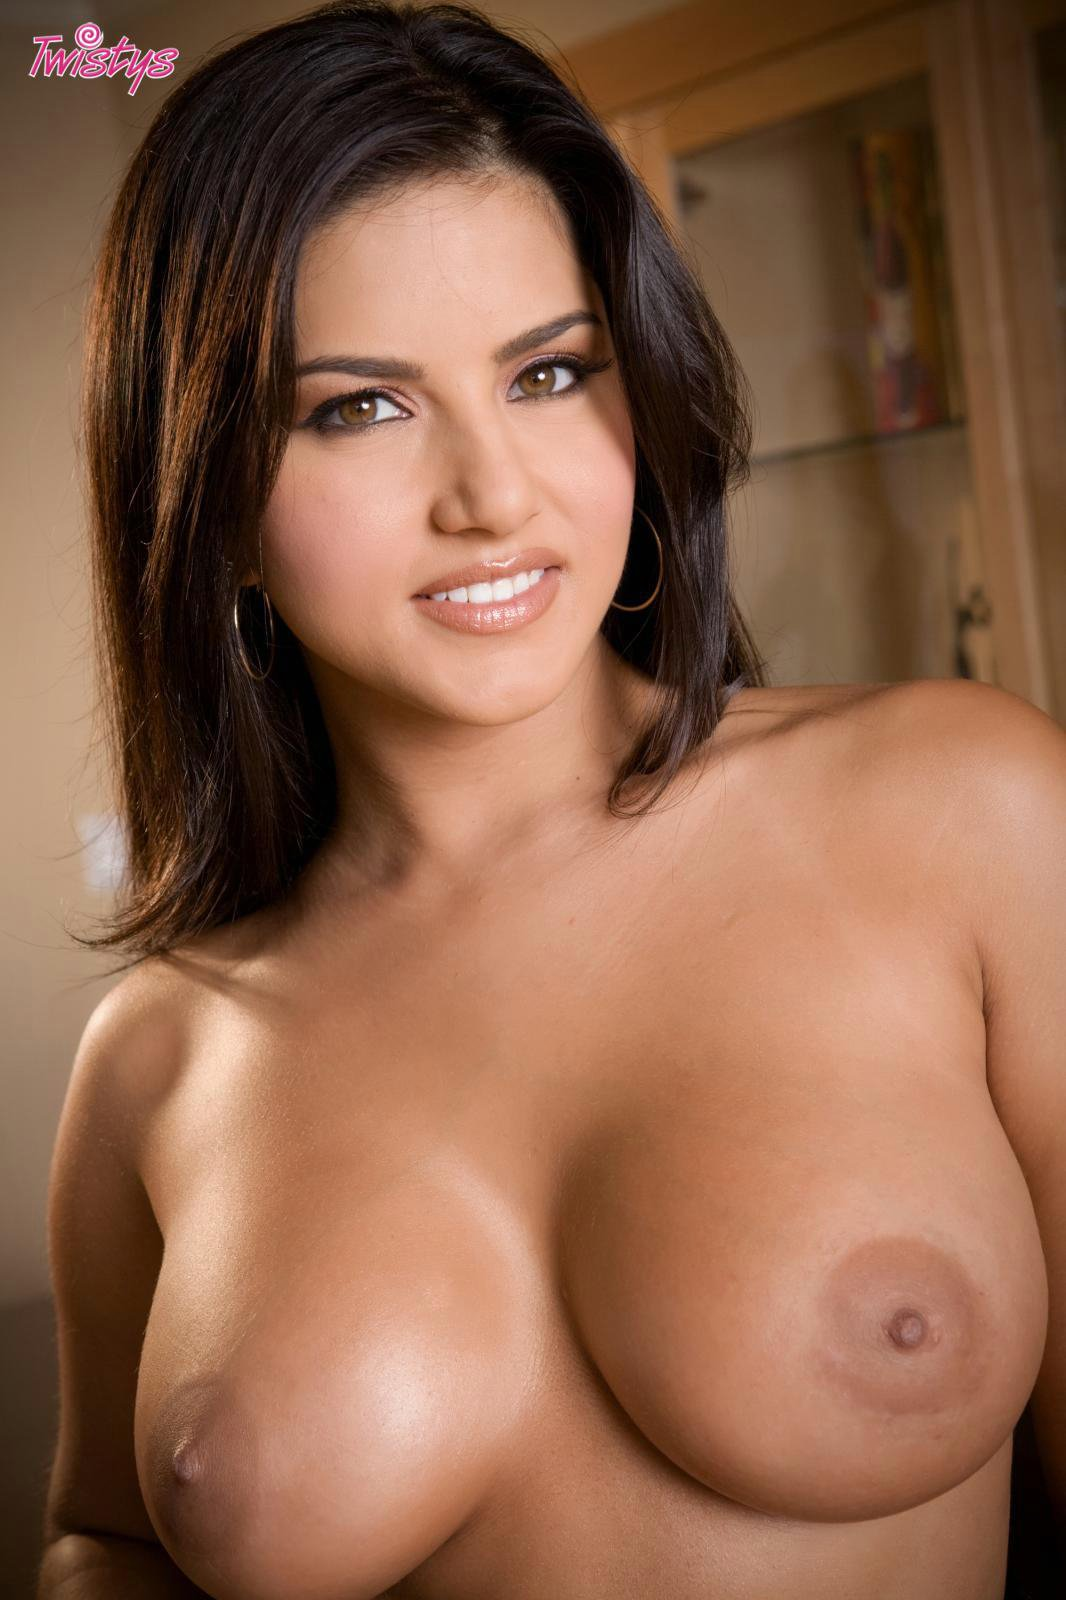 Porn star pussy tight pussy pics